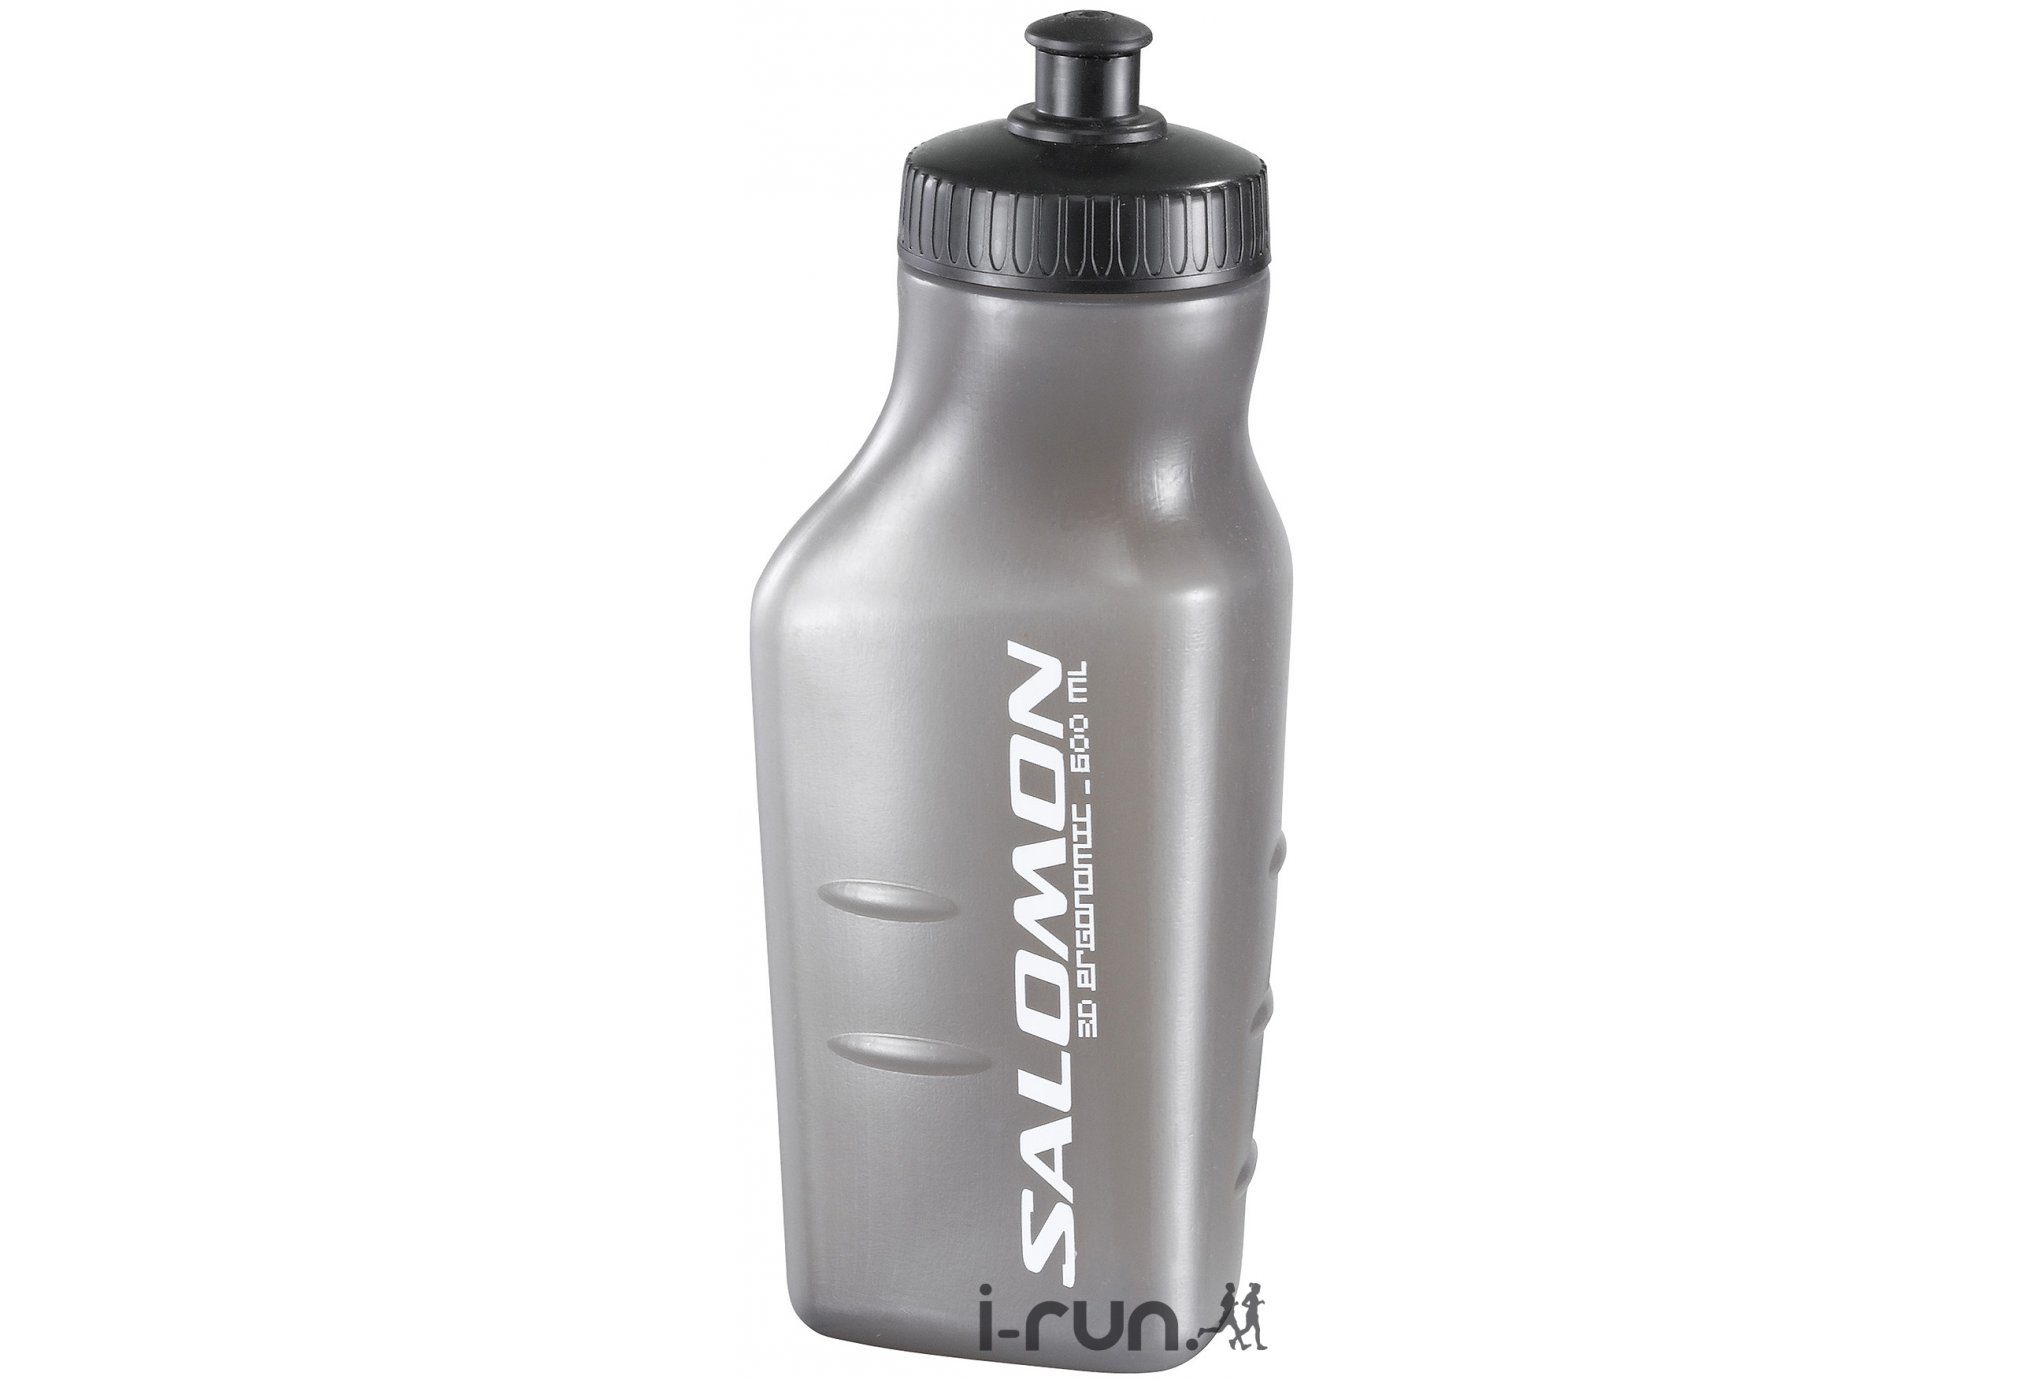 Salomon Bouteille 3D 600mL Sac hydratation / Gourde